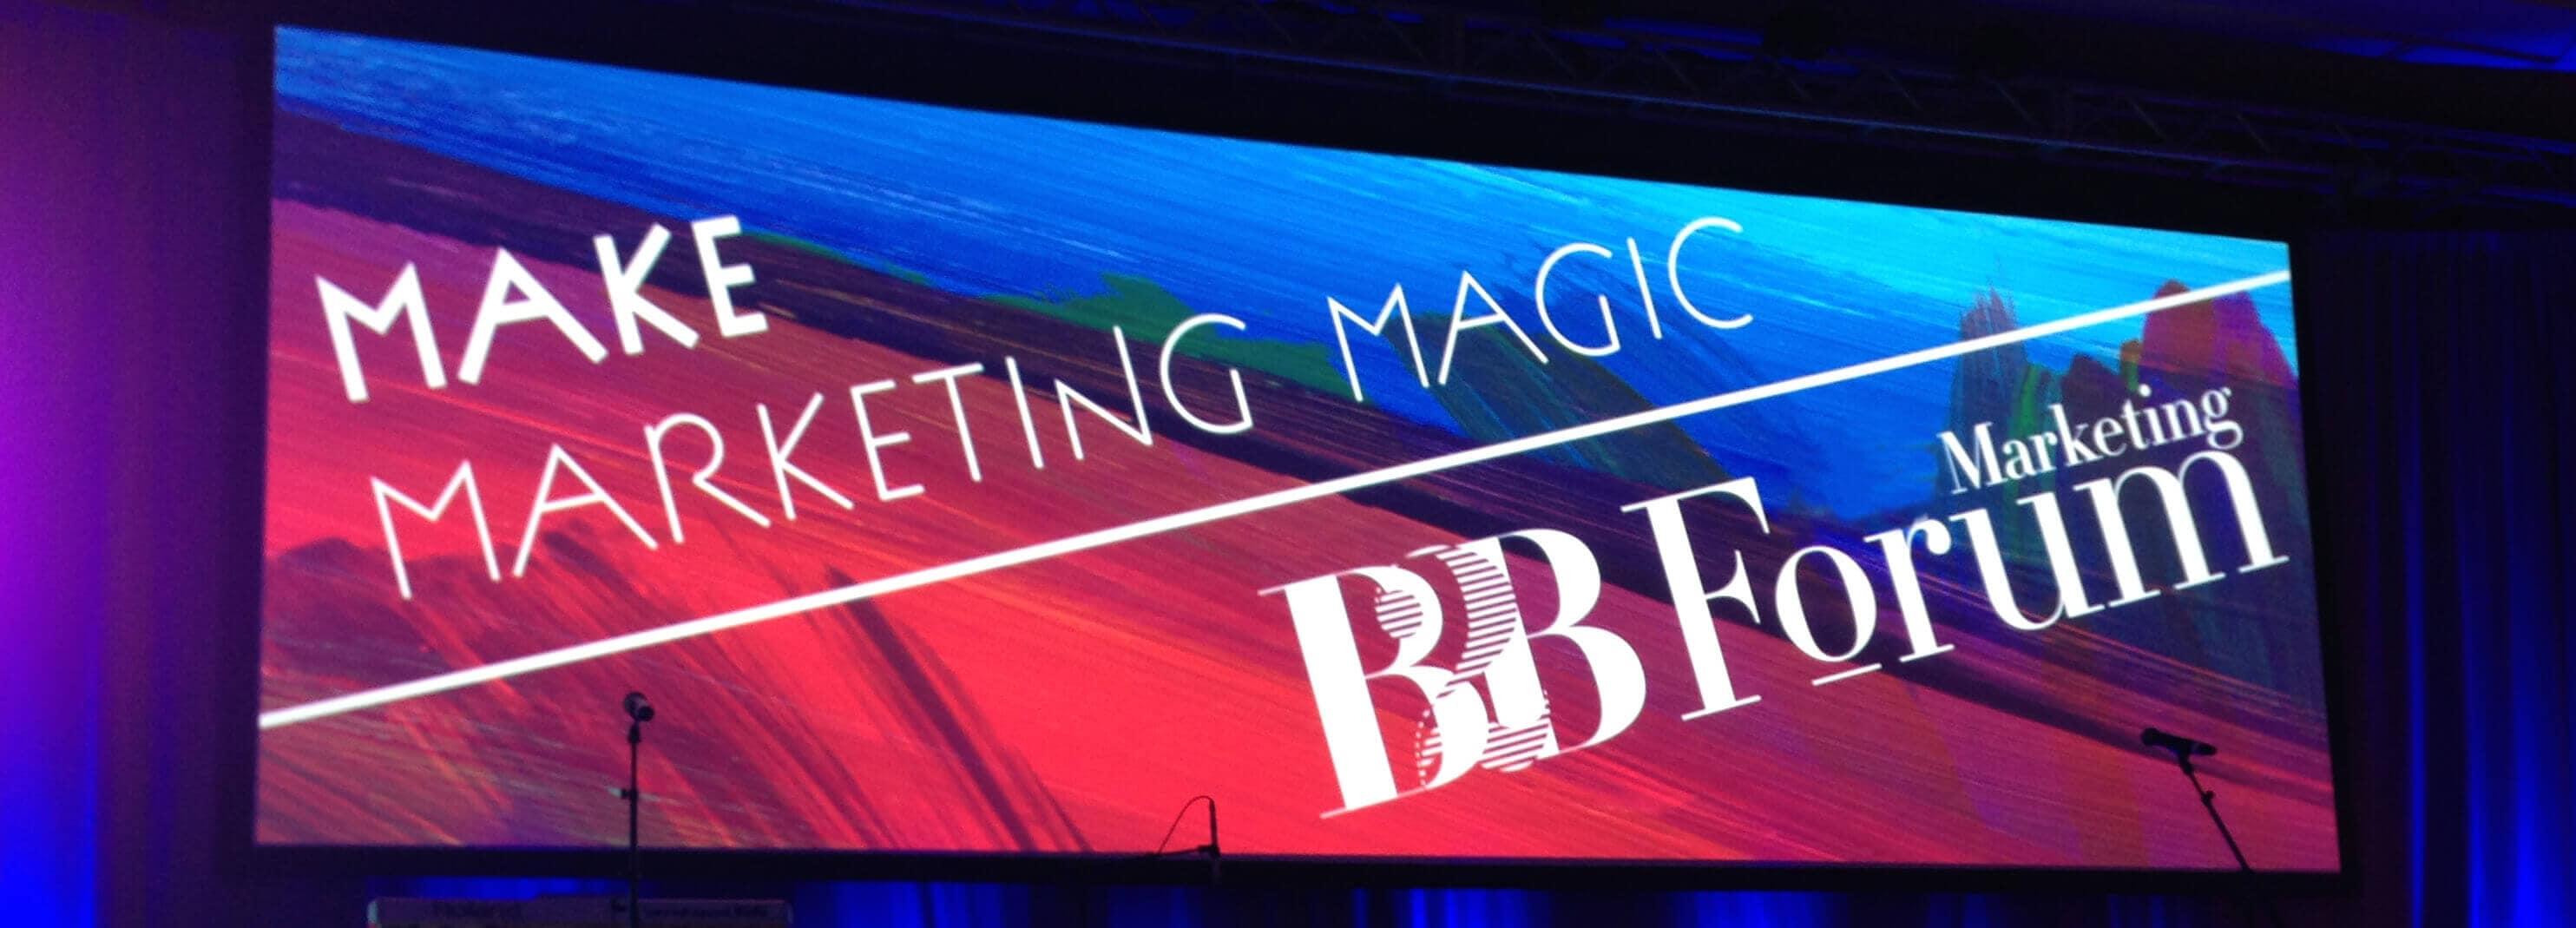 Marketing-Profs-B2B-Digital Marketing-Forum